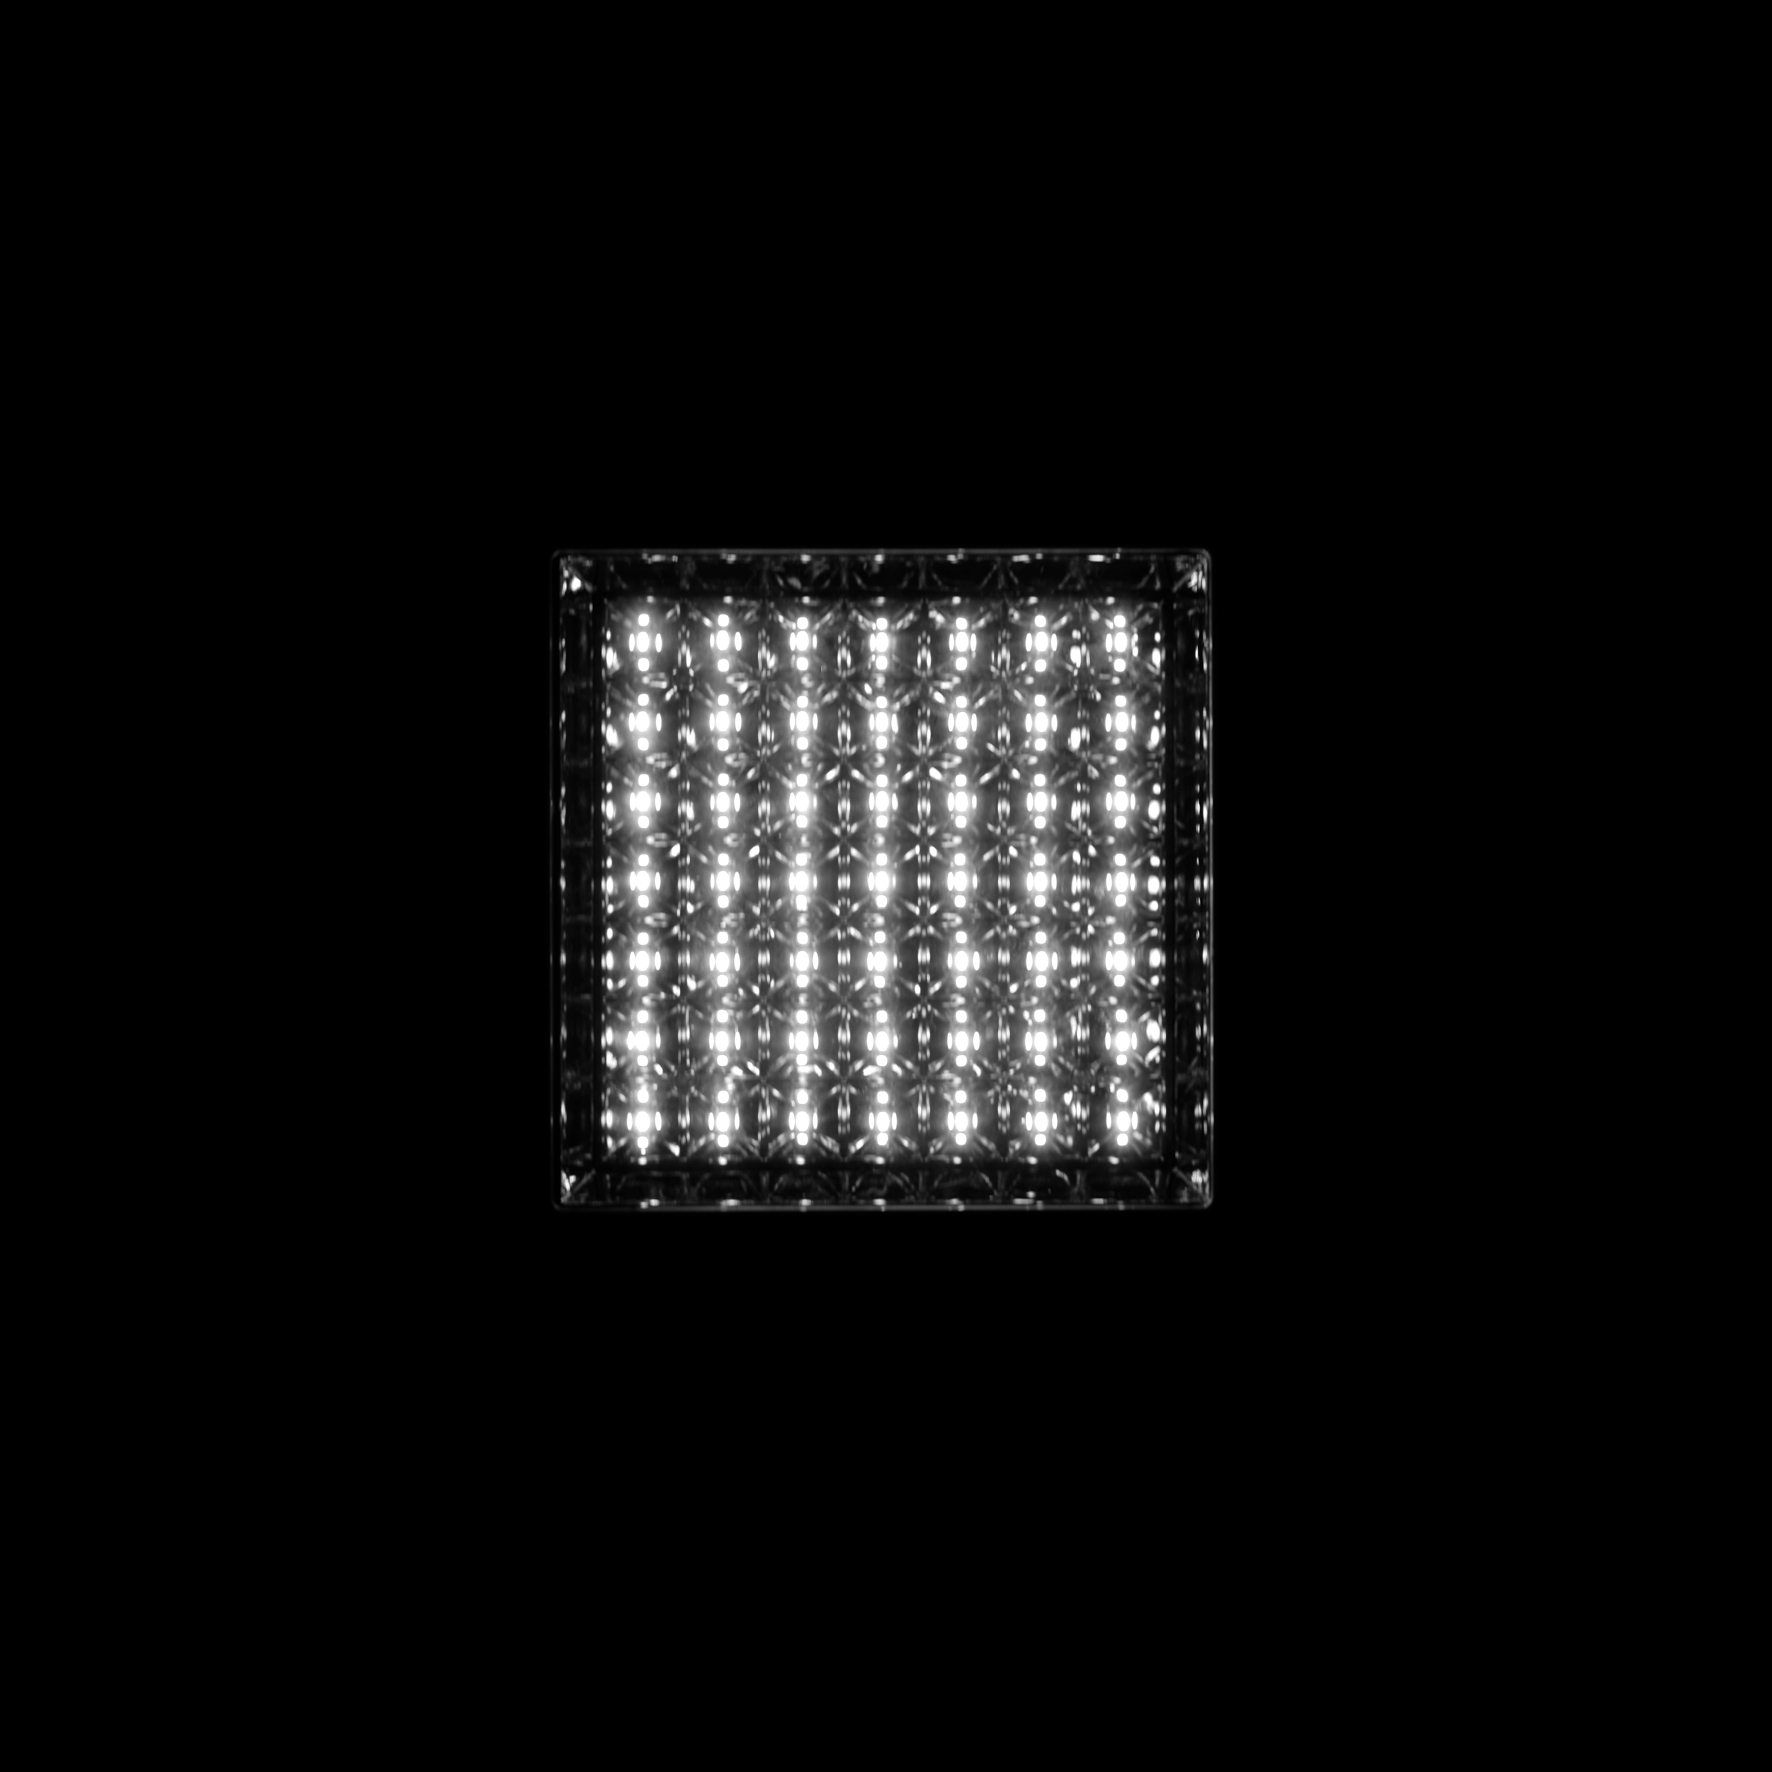 20151207-_DSC0476.jpg